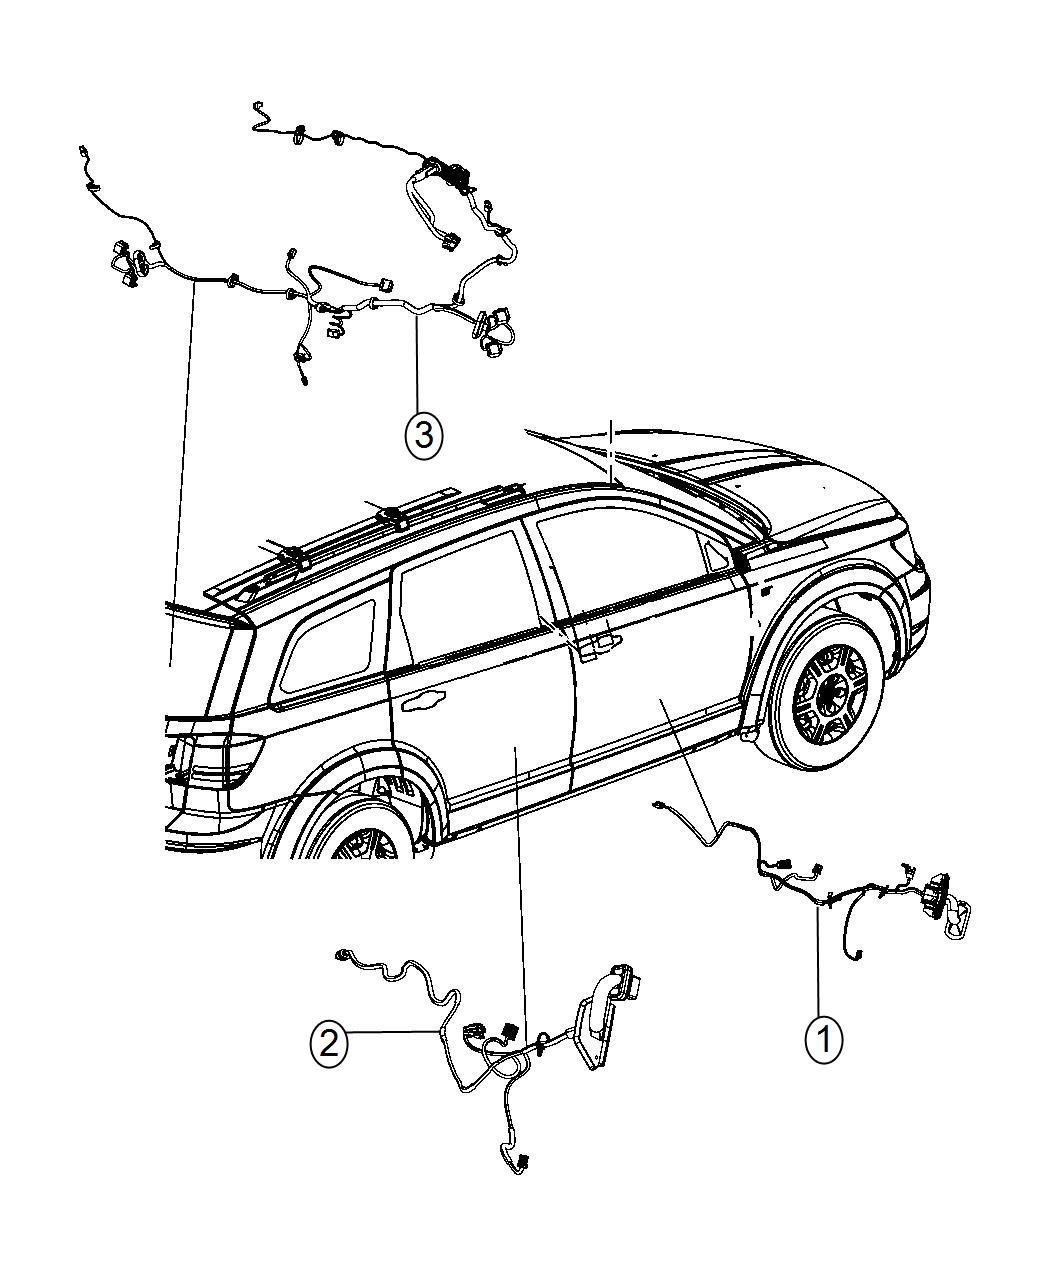 2014 Dodge Journey Wiring. Liftgate. [parkview(tm) rear